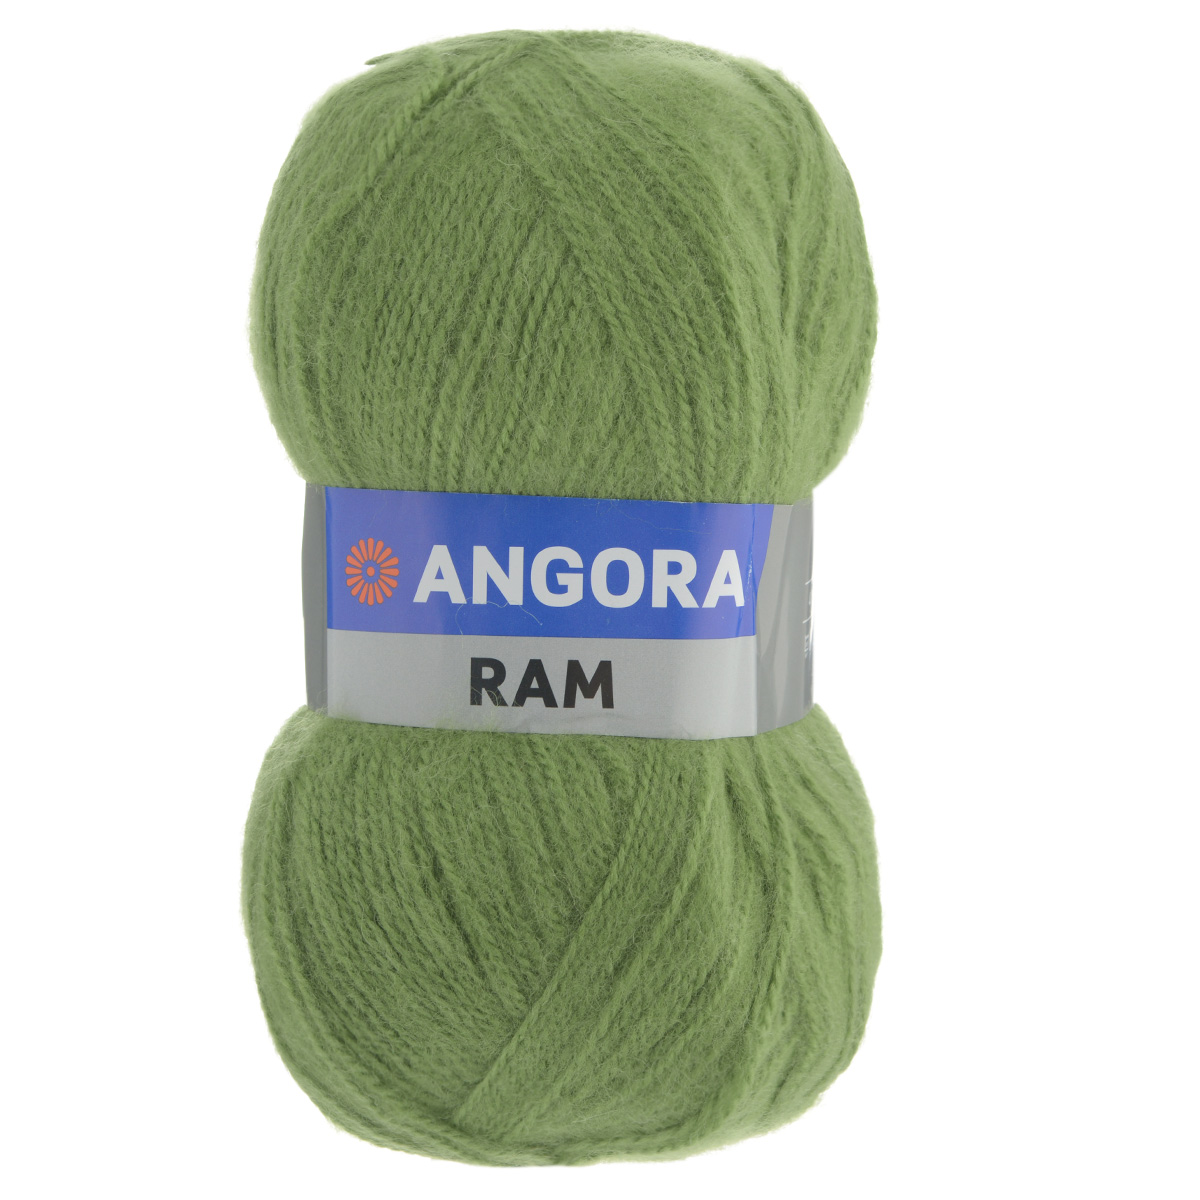 "Пряжа для вязания YarnArt ""Angora Ram"", цвет: темно-зеленый (098), 500 м, 100 г, 5 шт"